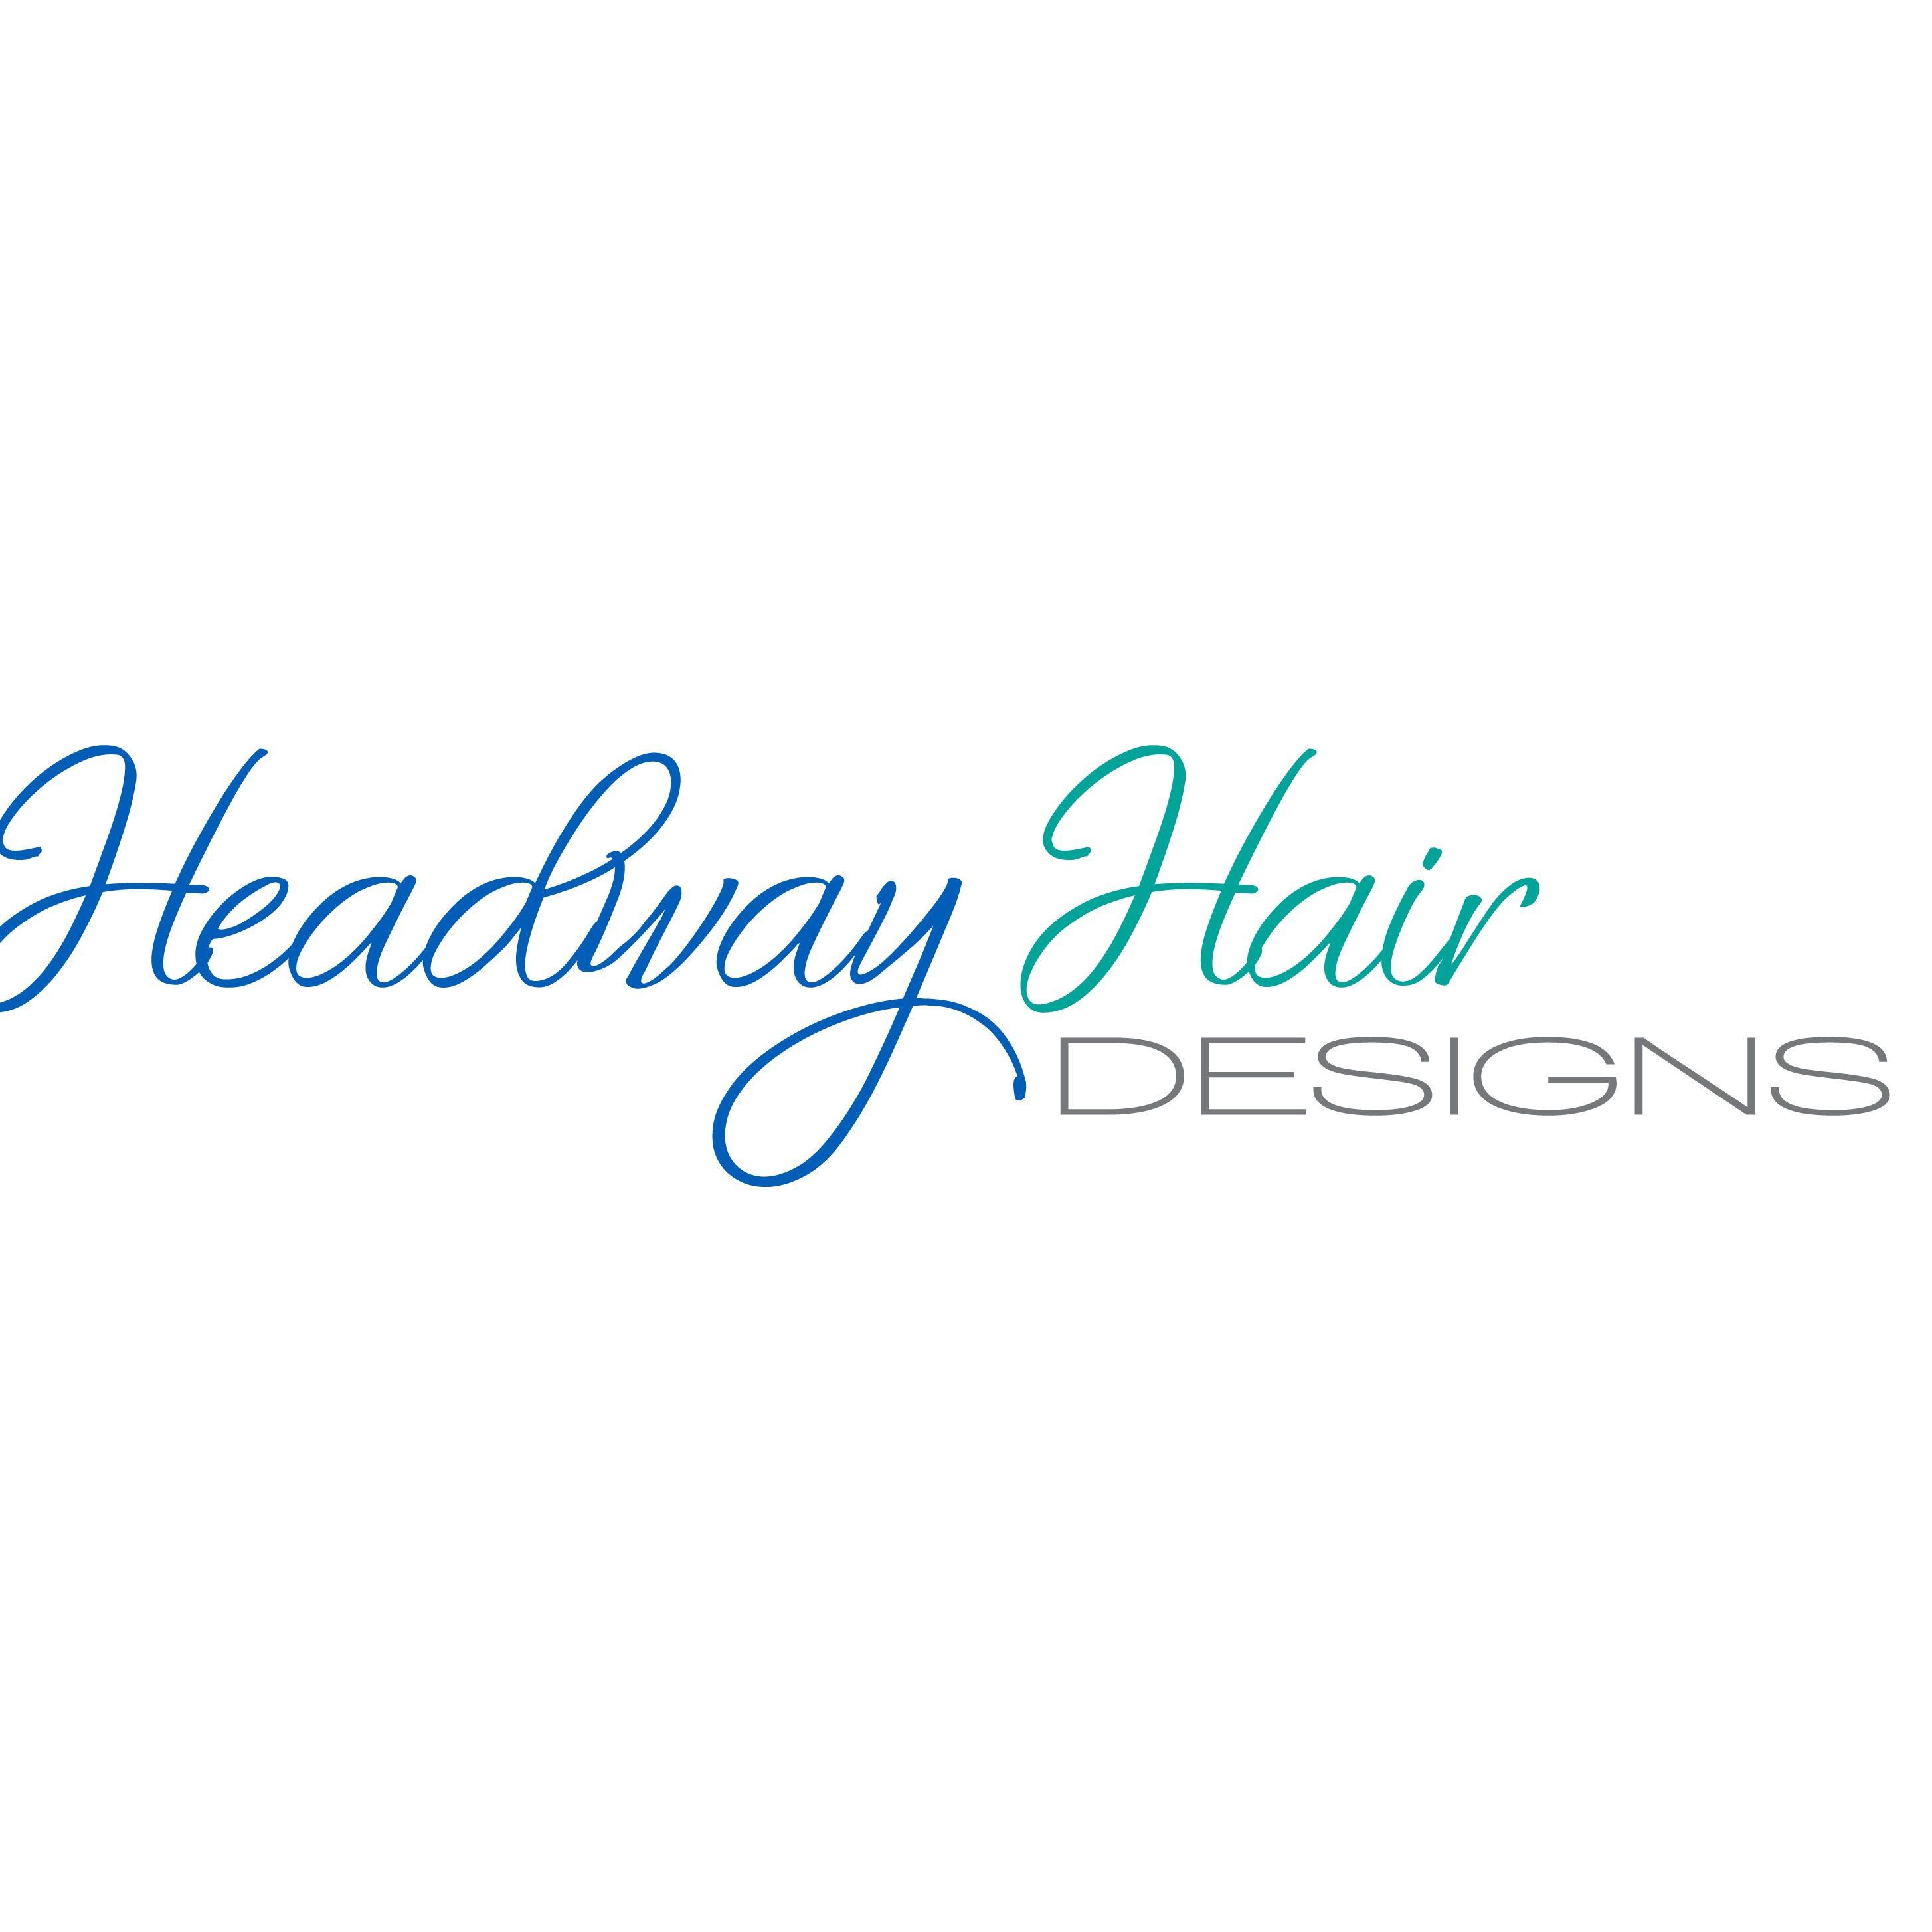 Headway hair